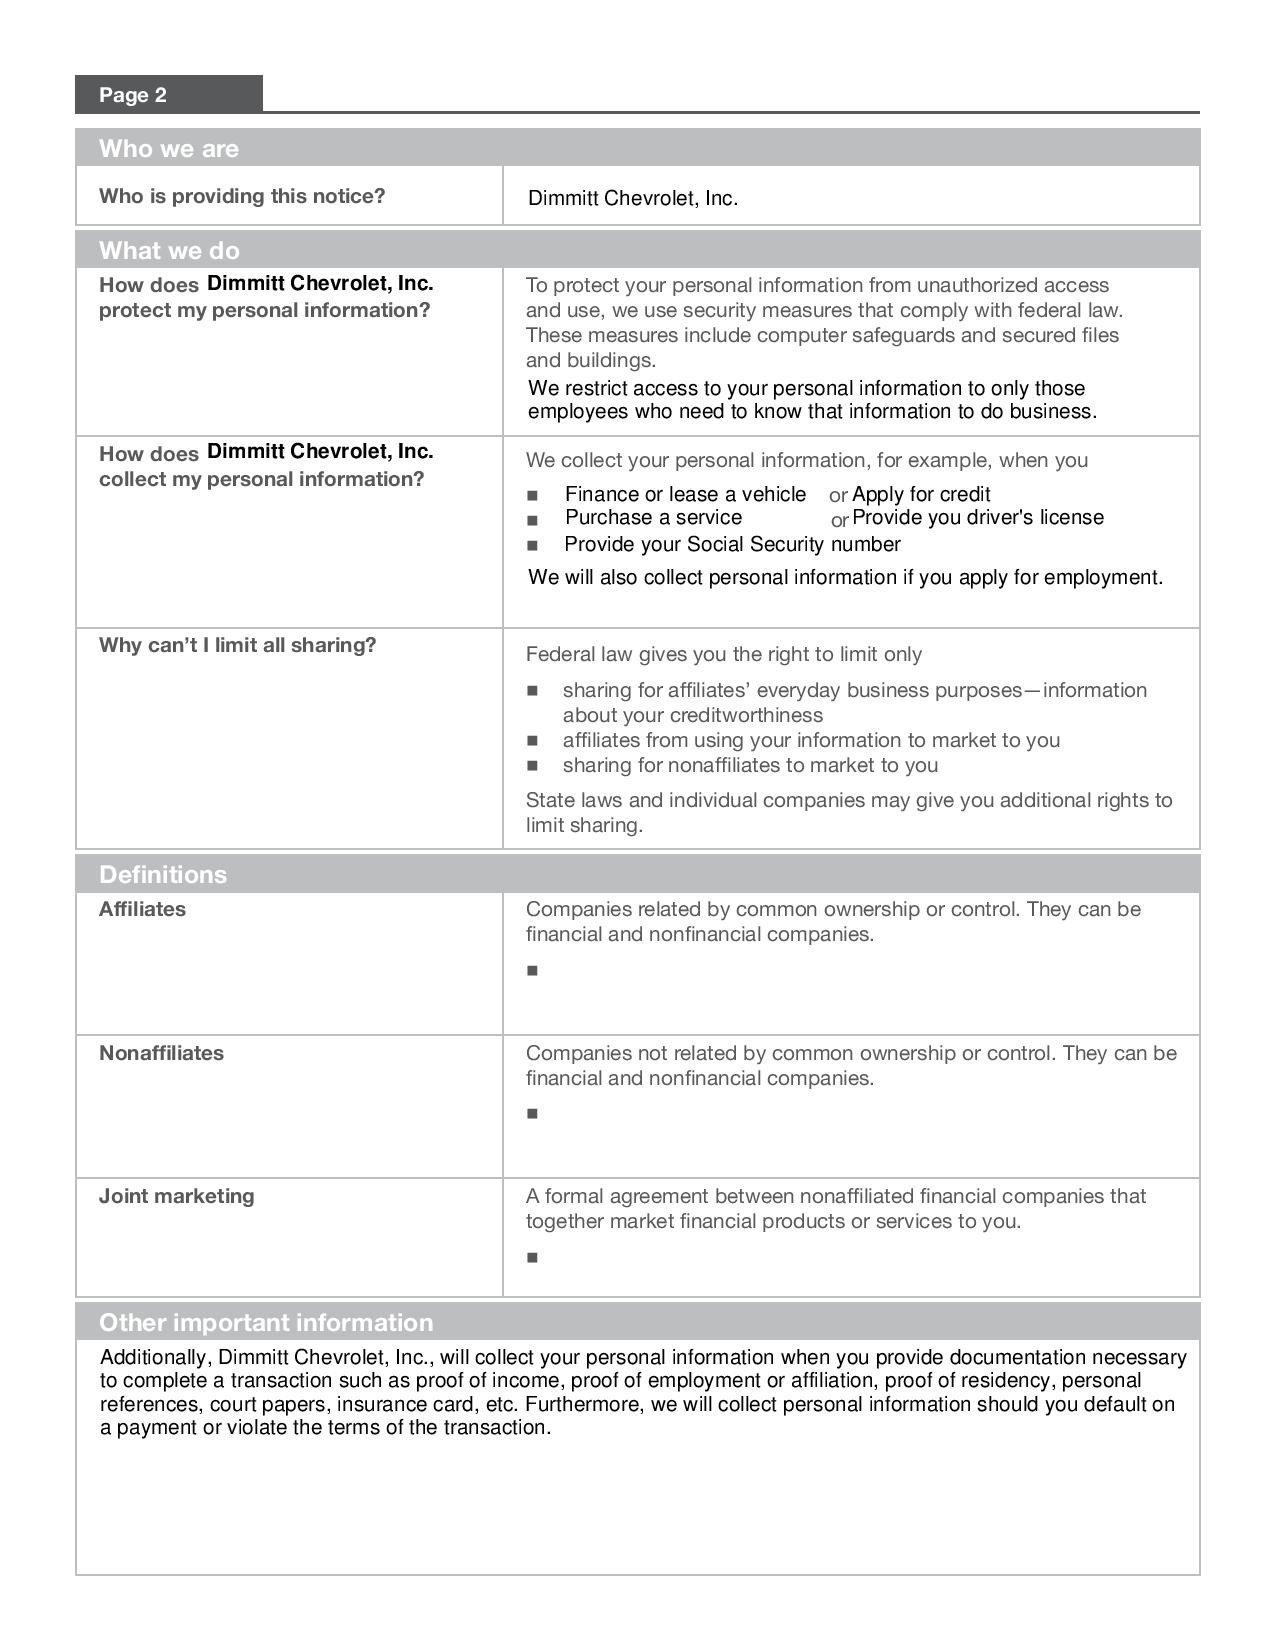 privacy notice pdf page 2